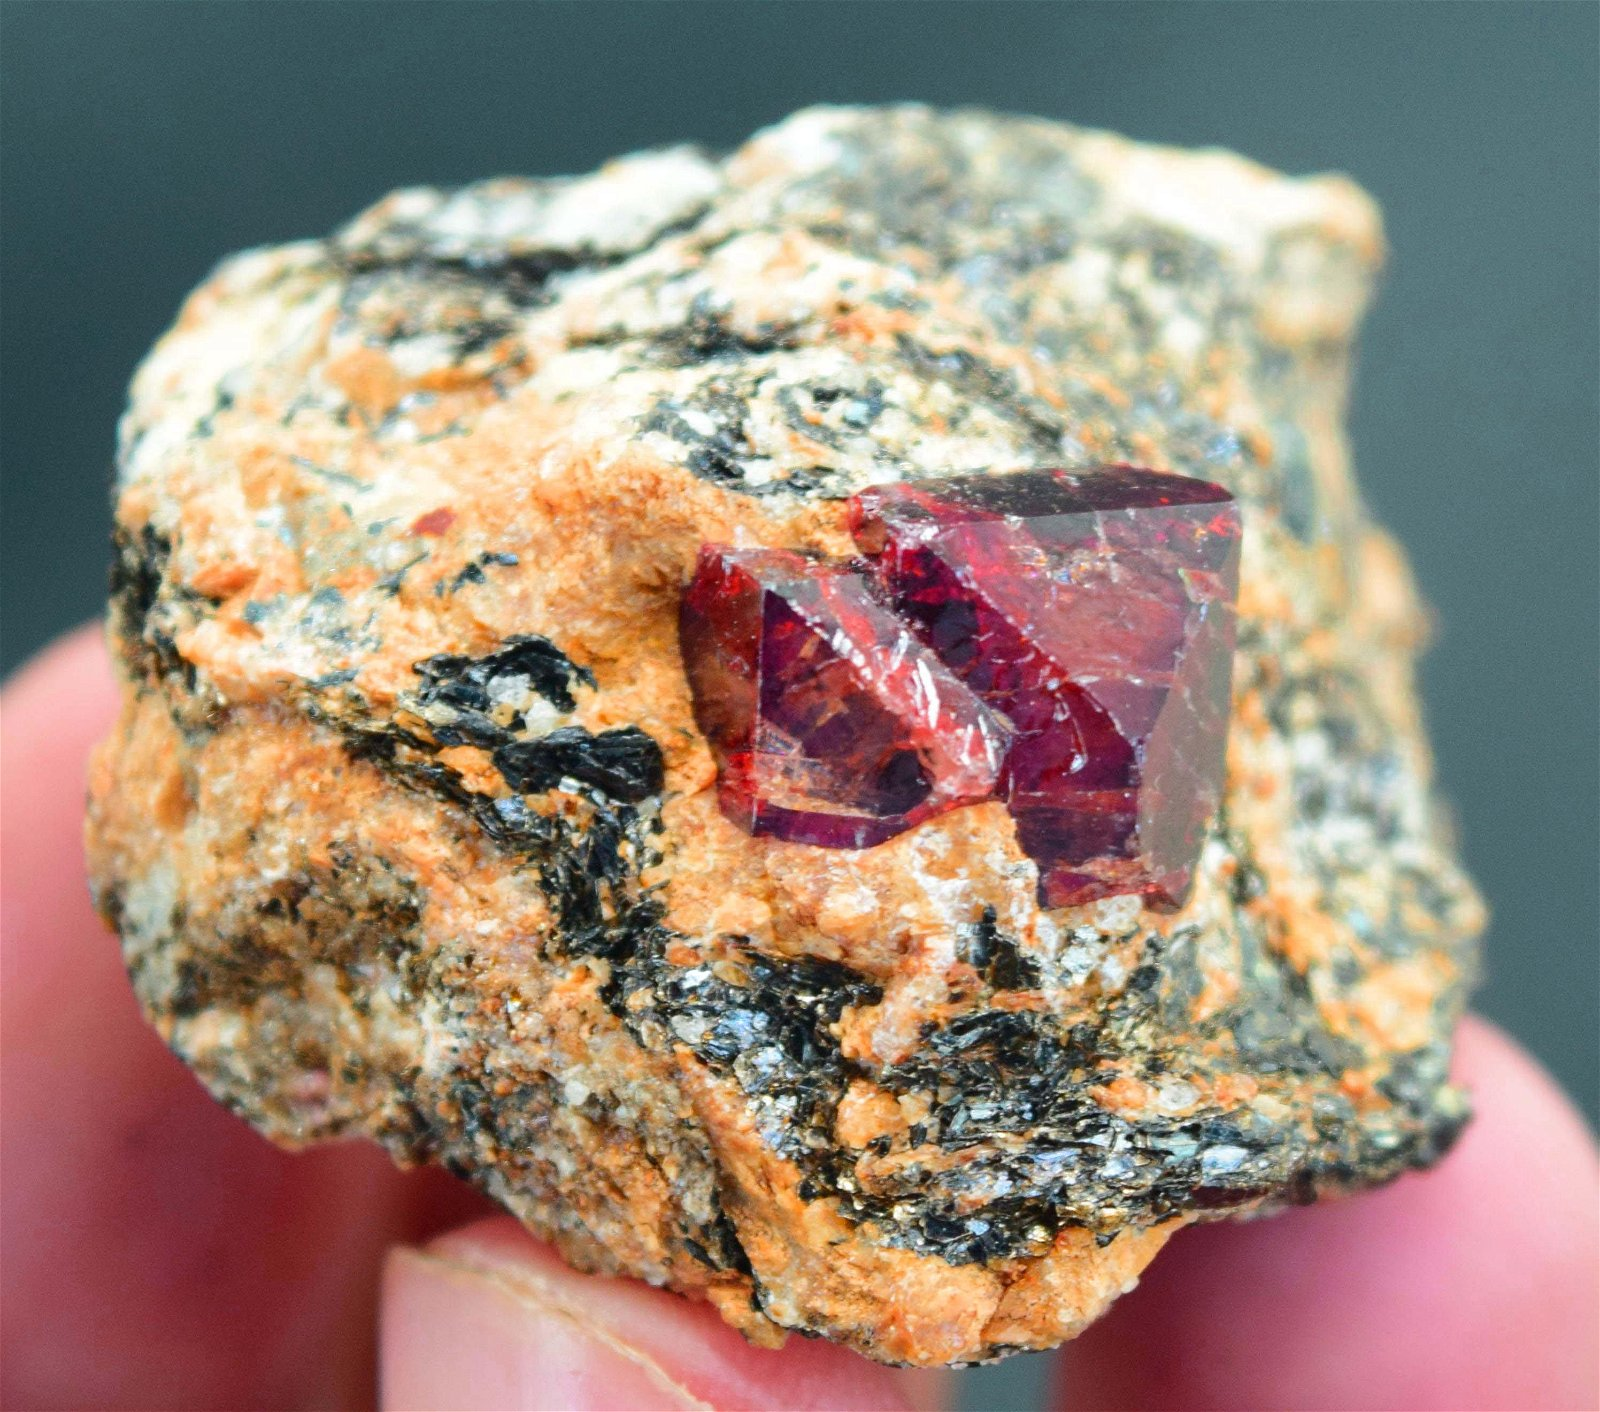 44 Gram Rare Terminated & Undamaged Blood Red Color